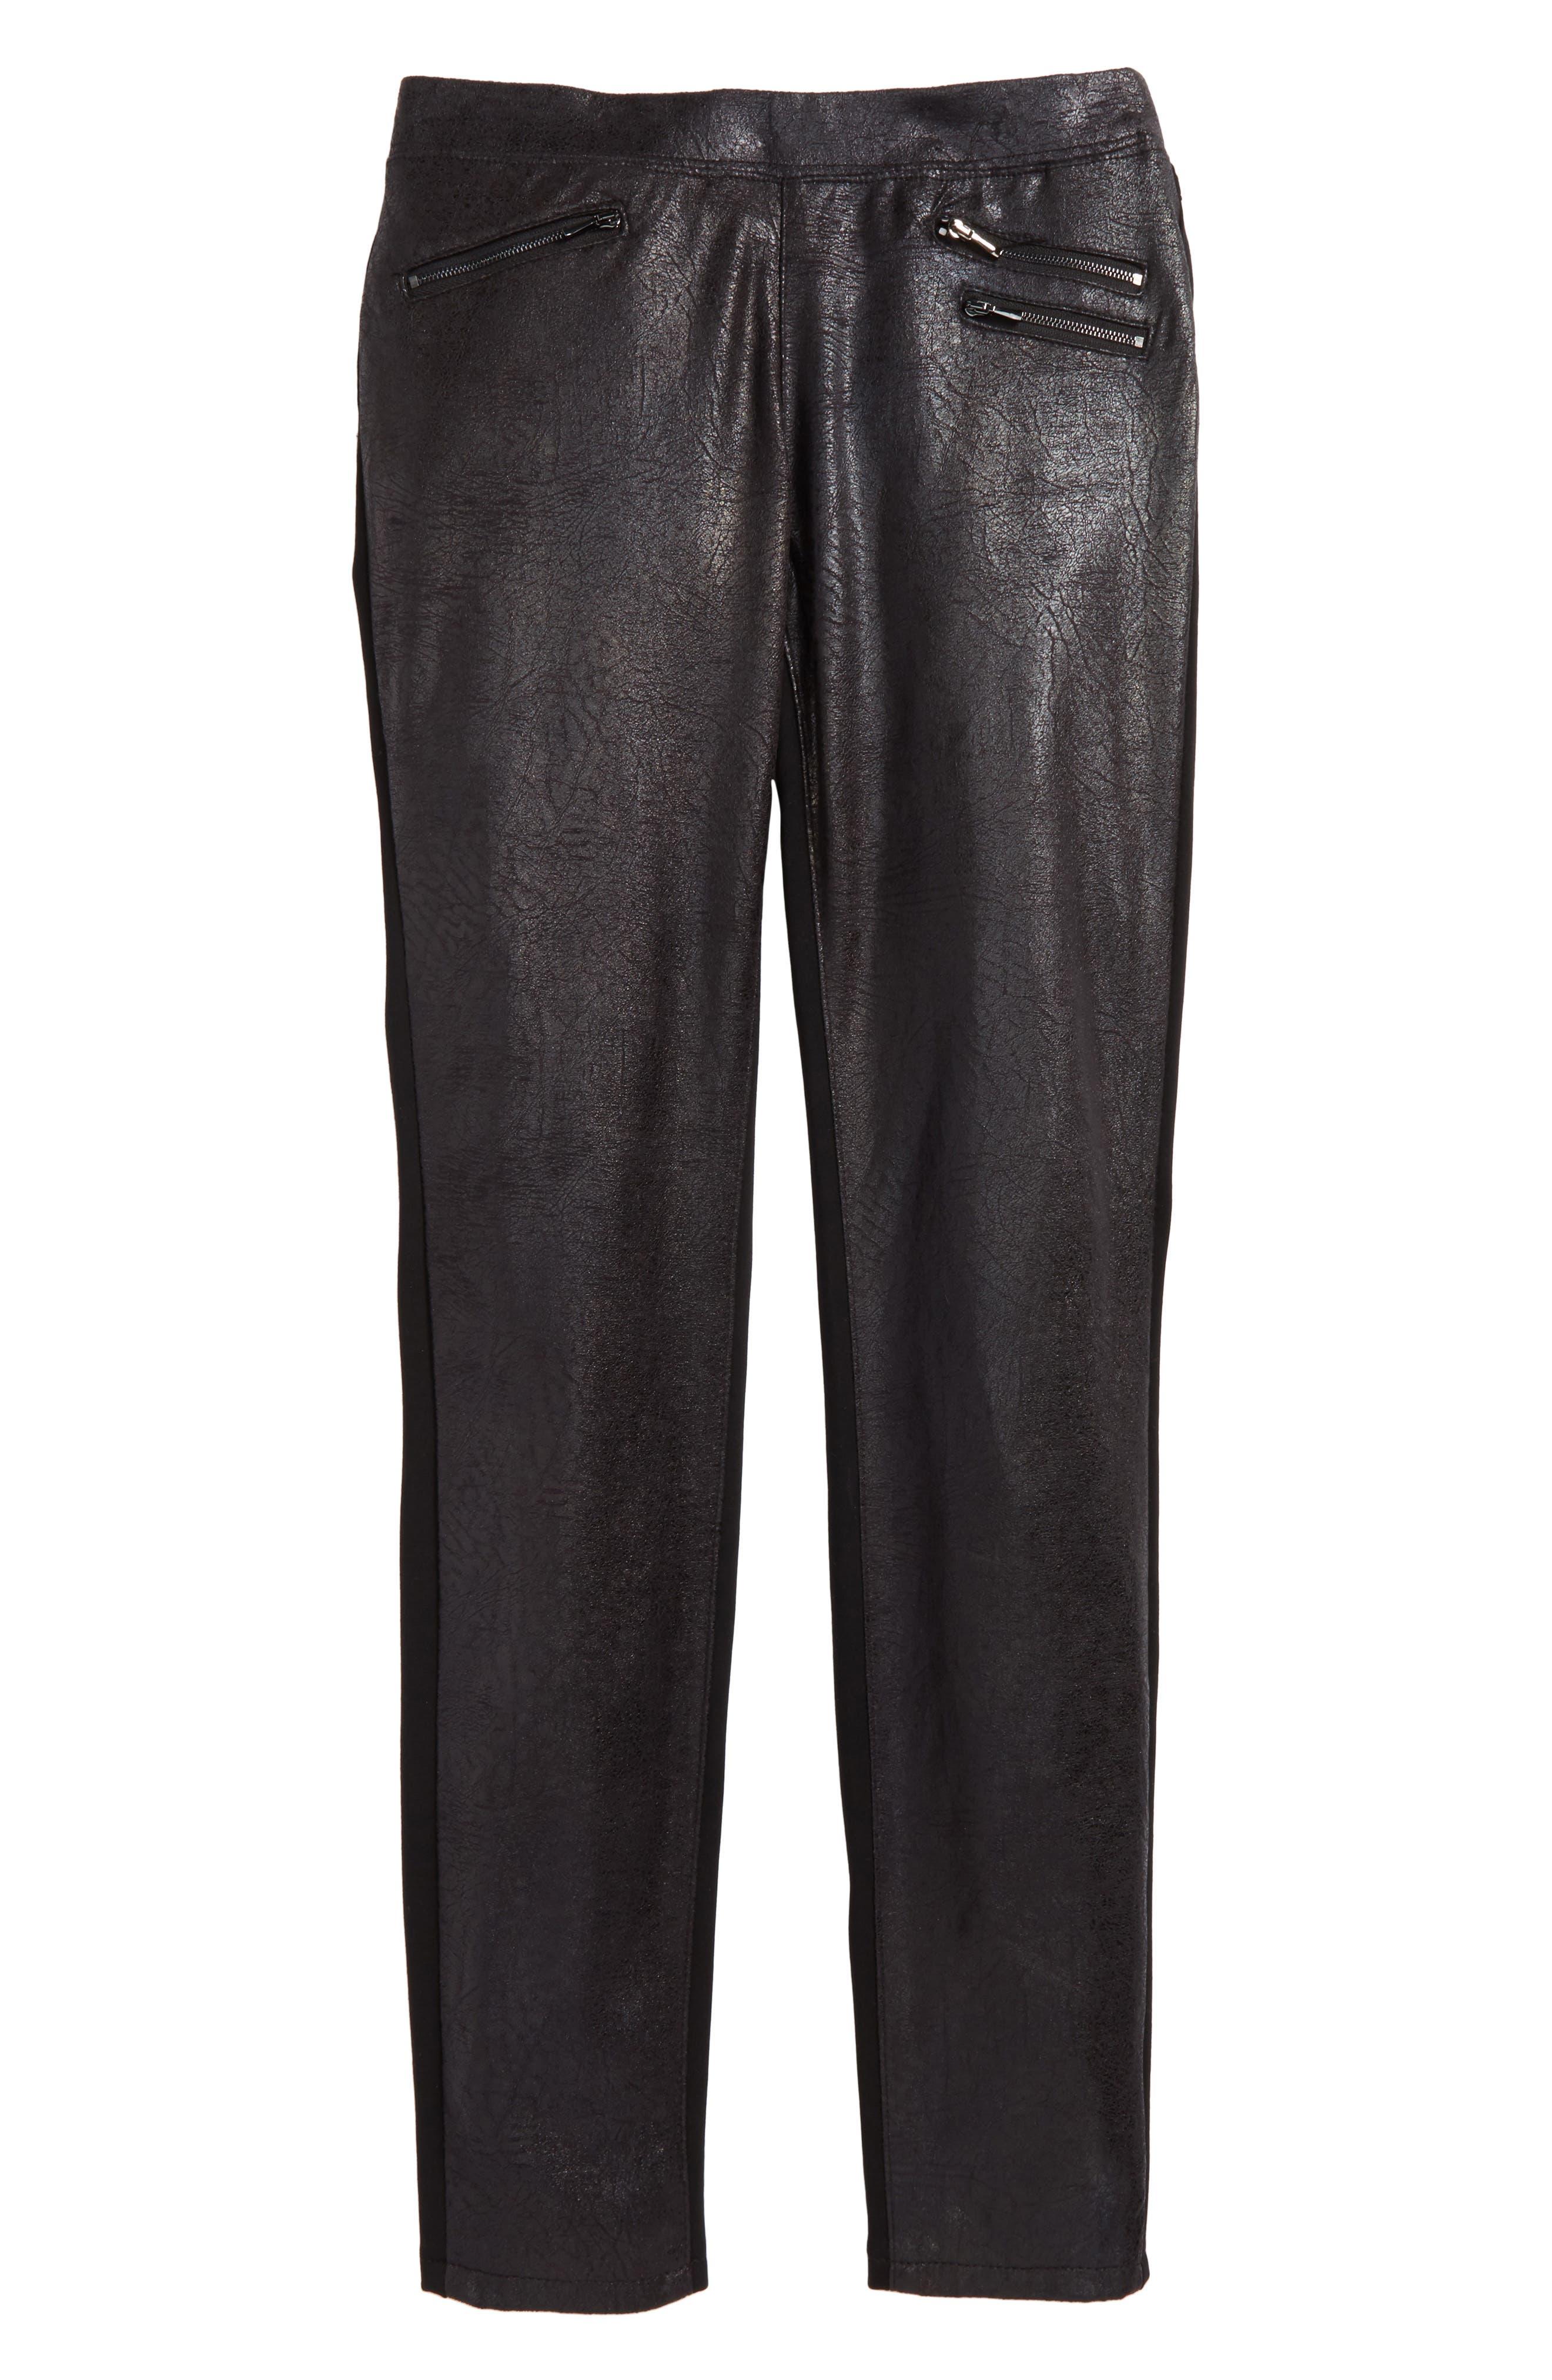 Girls Tractr Crackle PullOn Pants Size 14  Black